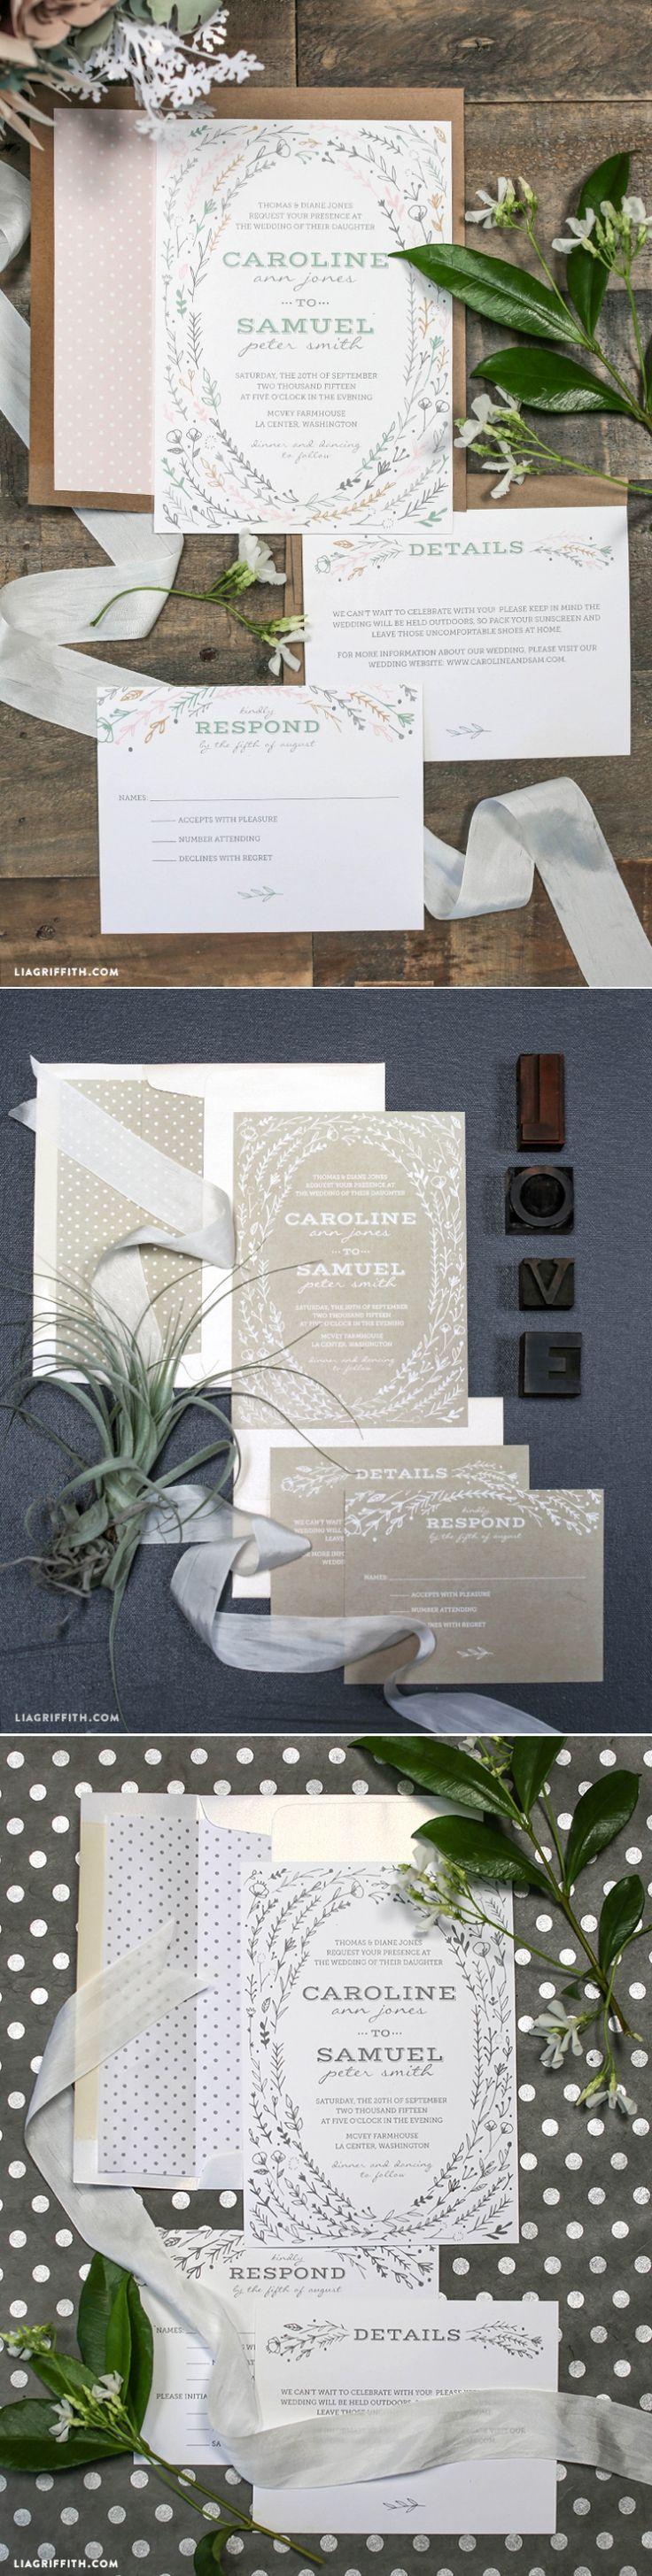 410 best wedding invitations images on Pinterest | Card wedding ...